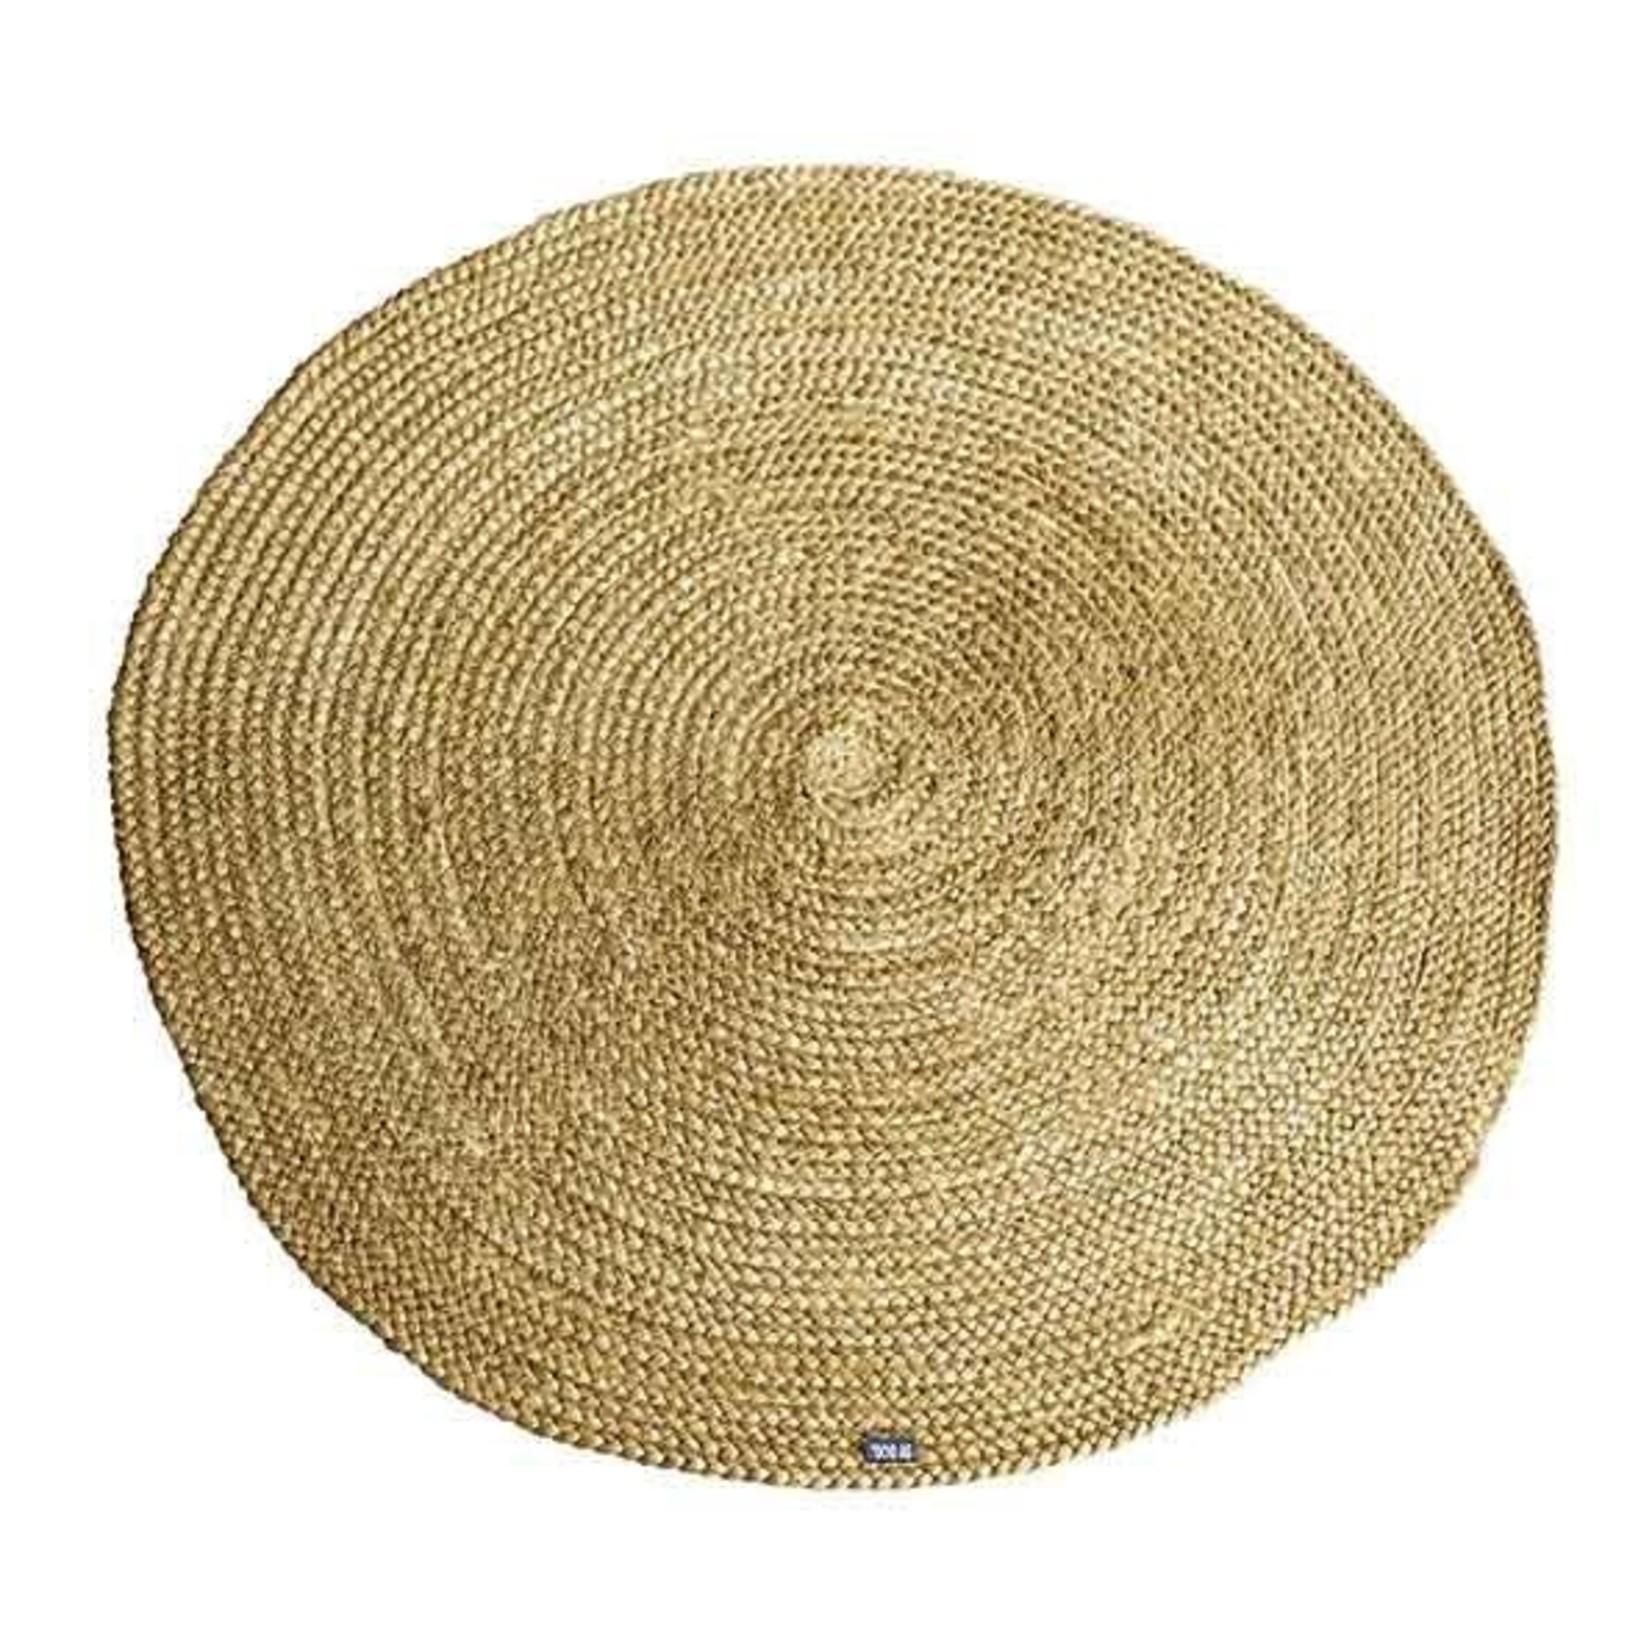 By Boo Carpet Jute round 120x120 cm - yellow